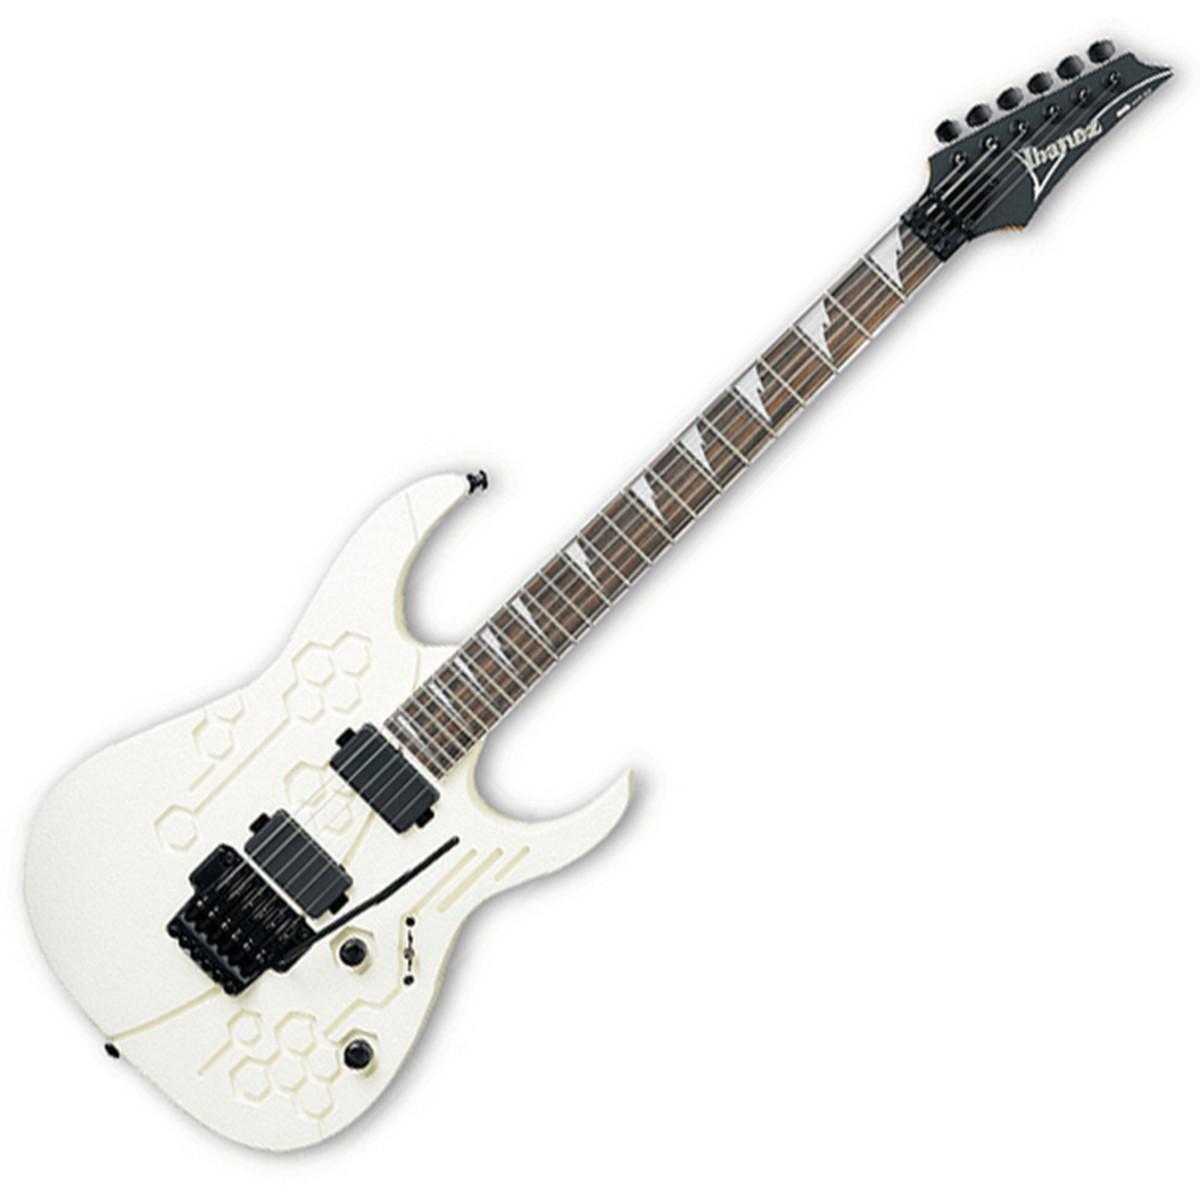 ibanez rg420eg electric guitar white beehive at. Black Bedroom Furniture Sets. Home Design Ideas